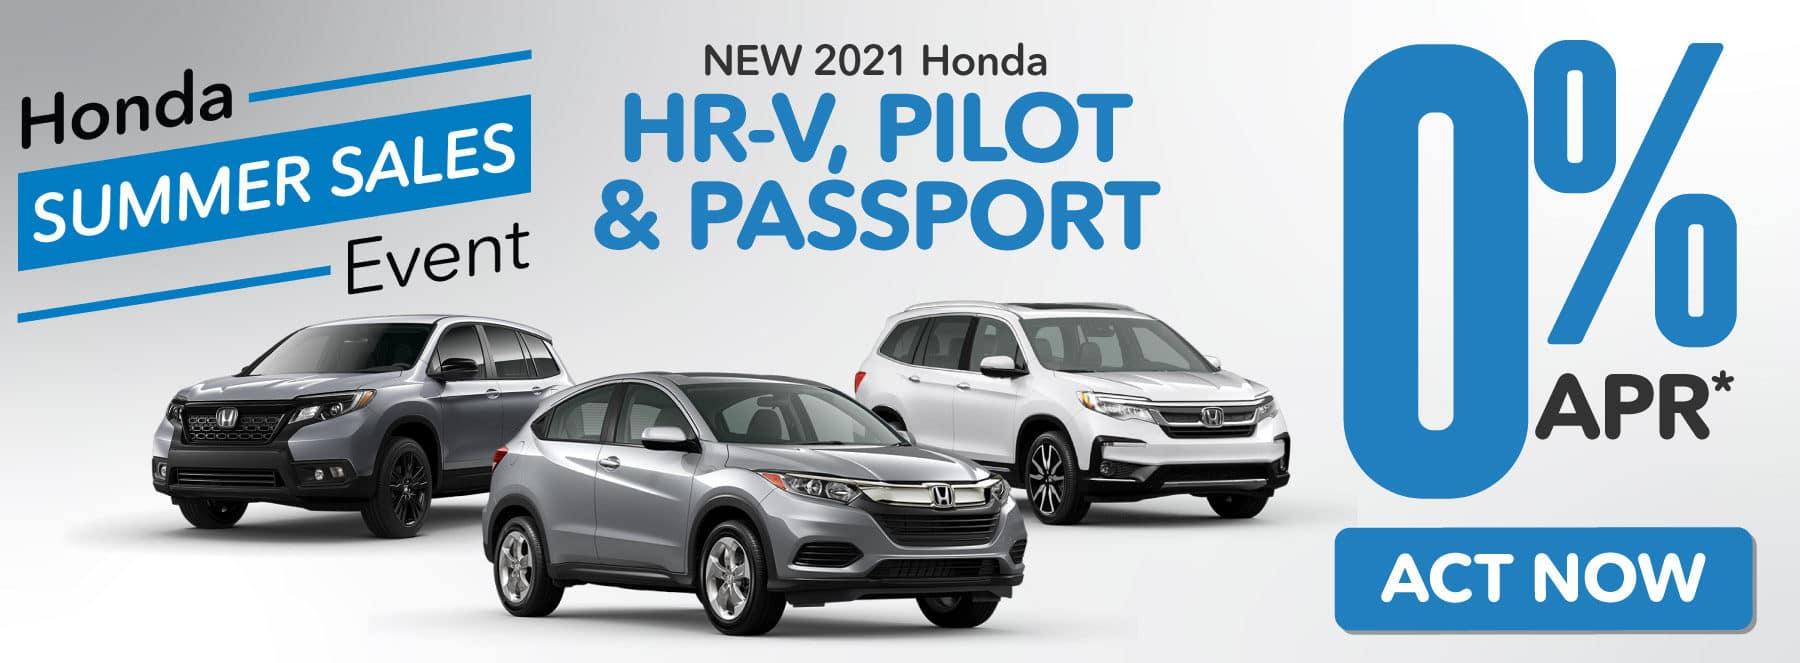 New 2021 Honda HR-V, Pilot, & Passport | 0% APR | ACT NOW